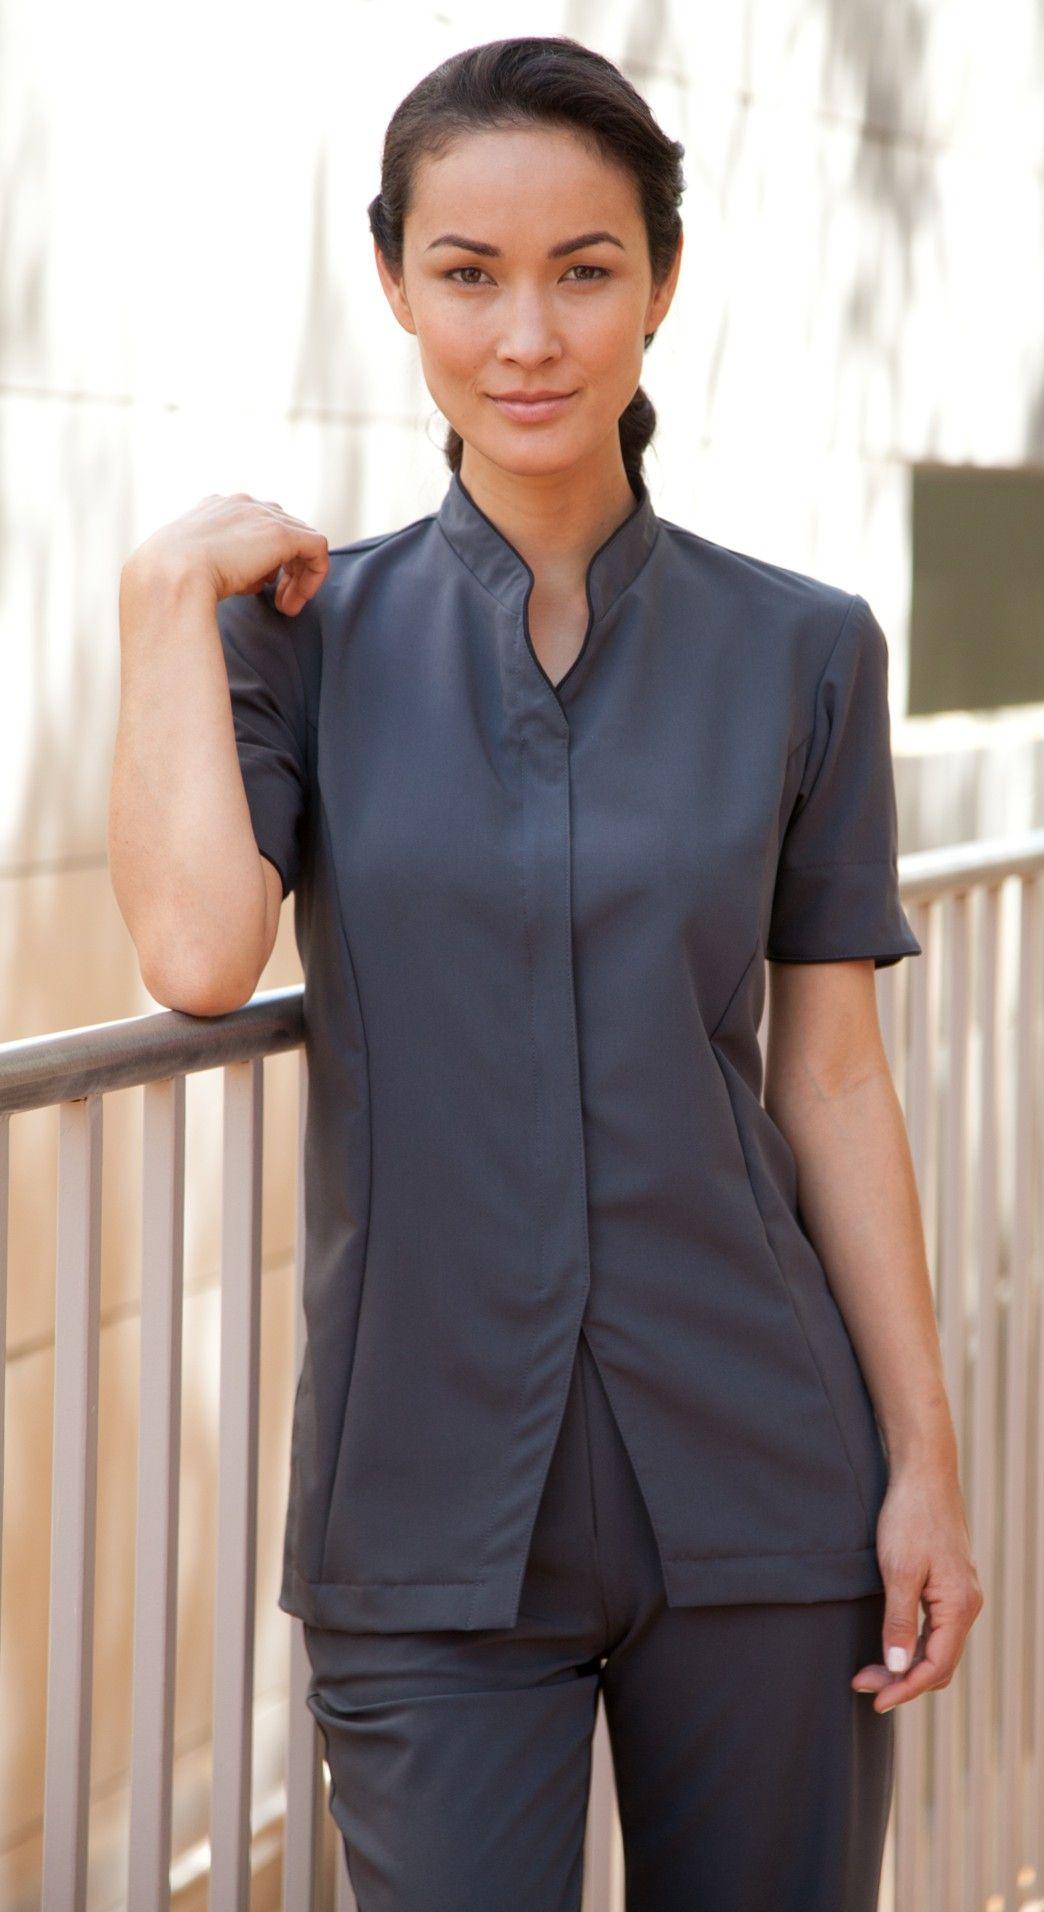 Alina custom spa uniform 7420 charcoal lightweight for Uniform spa therapist